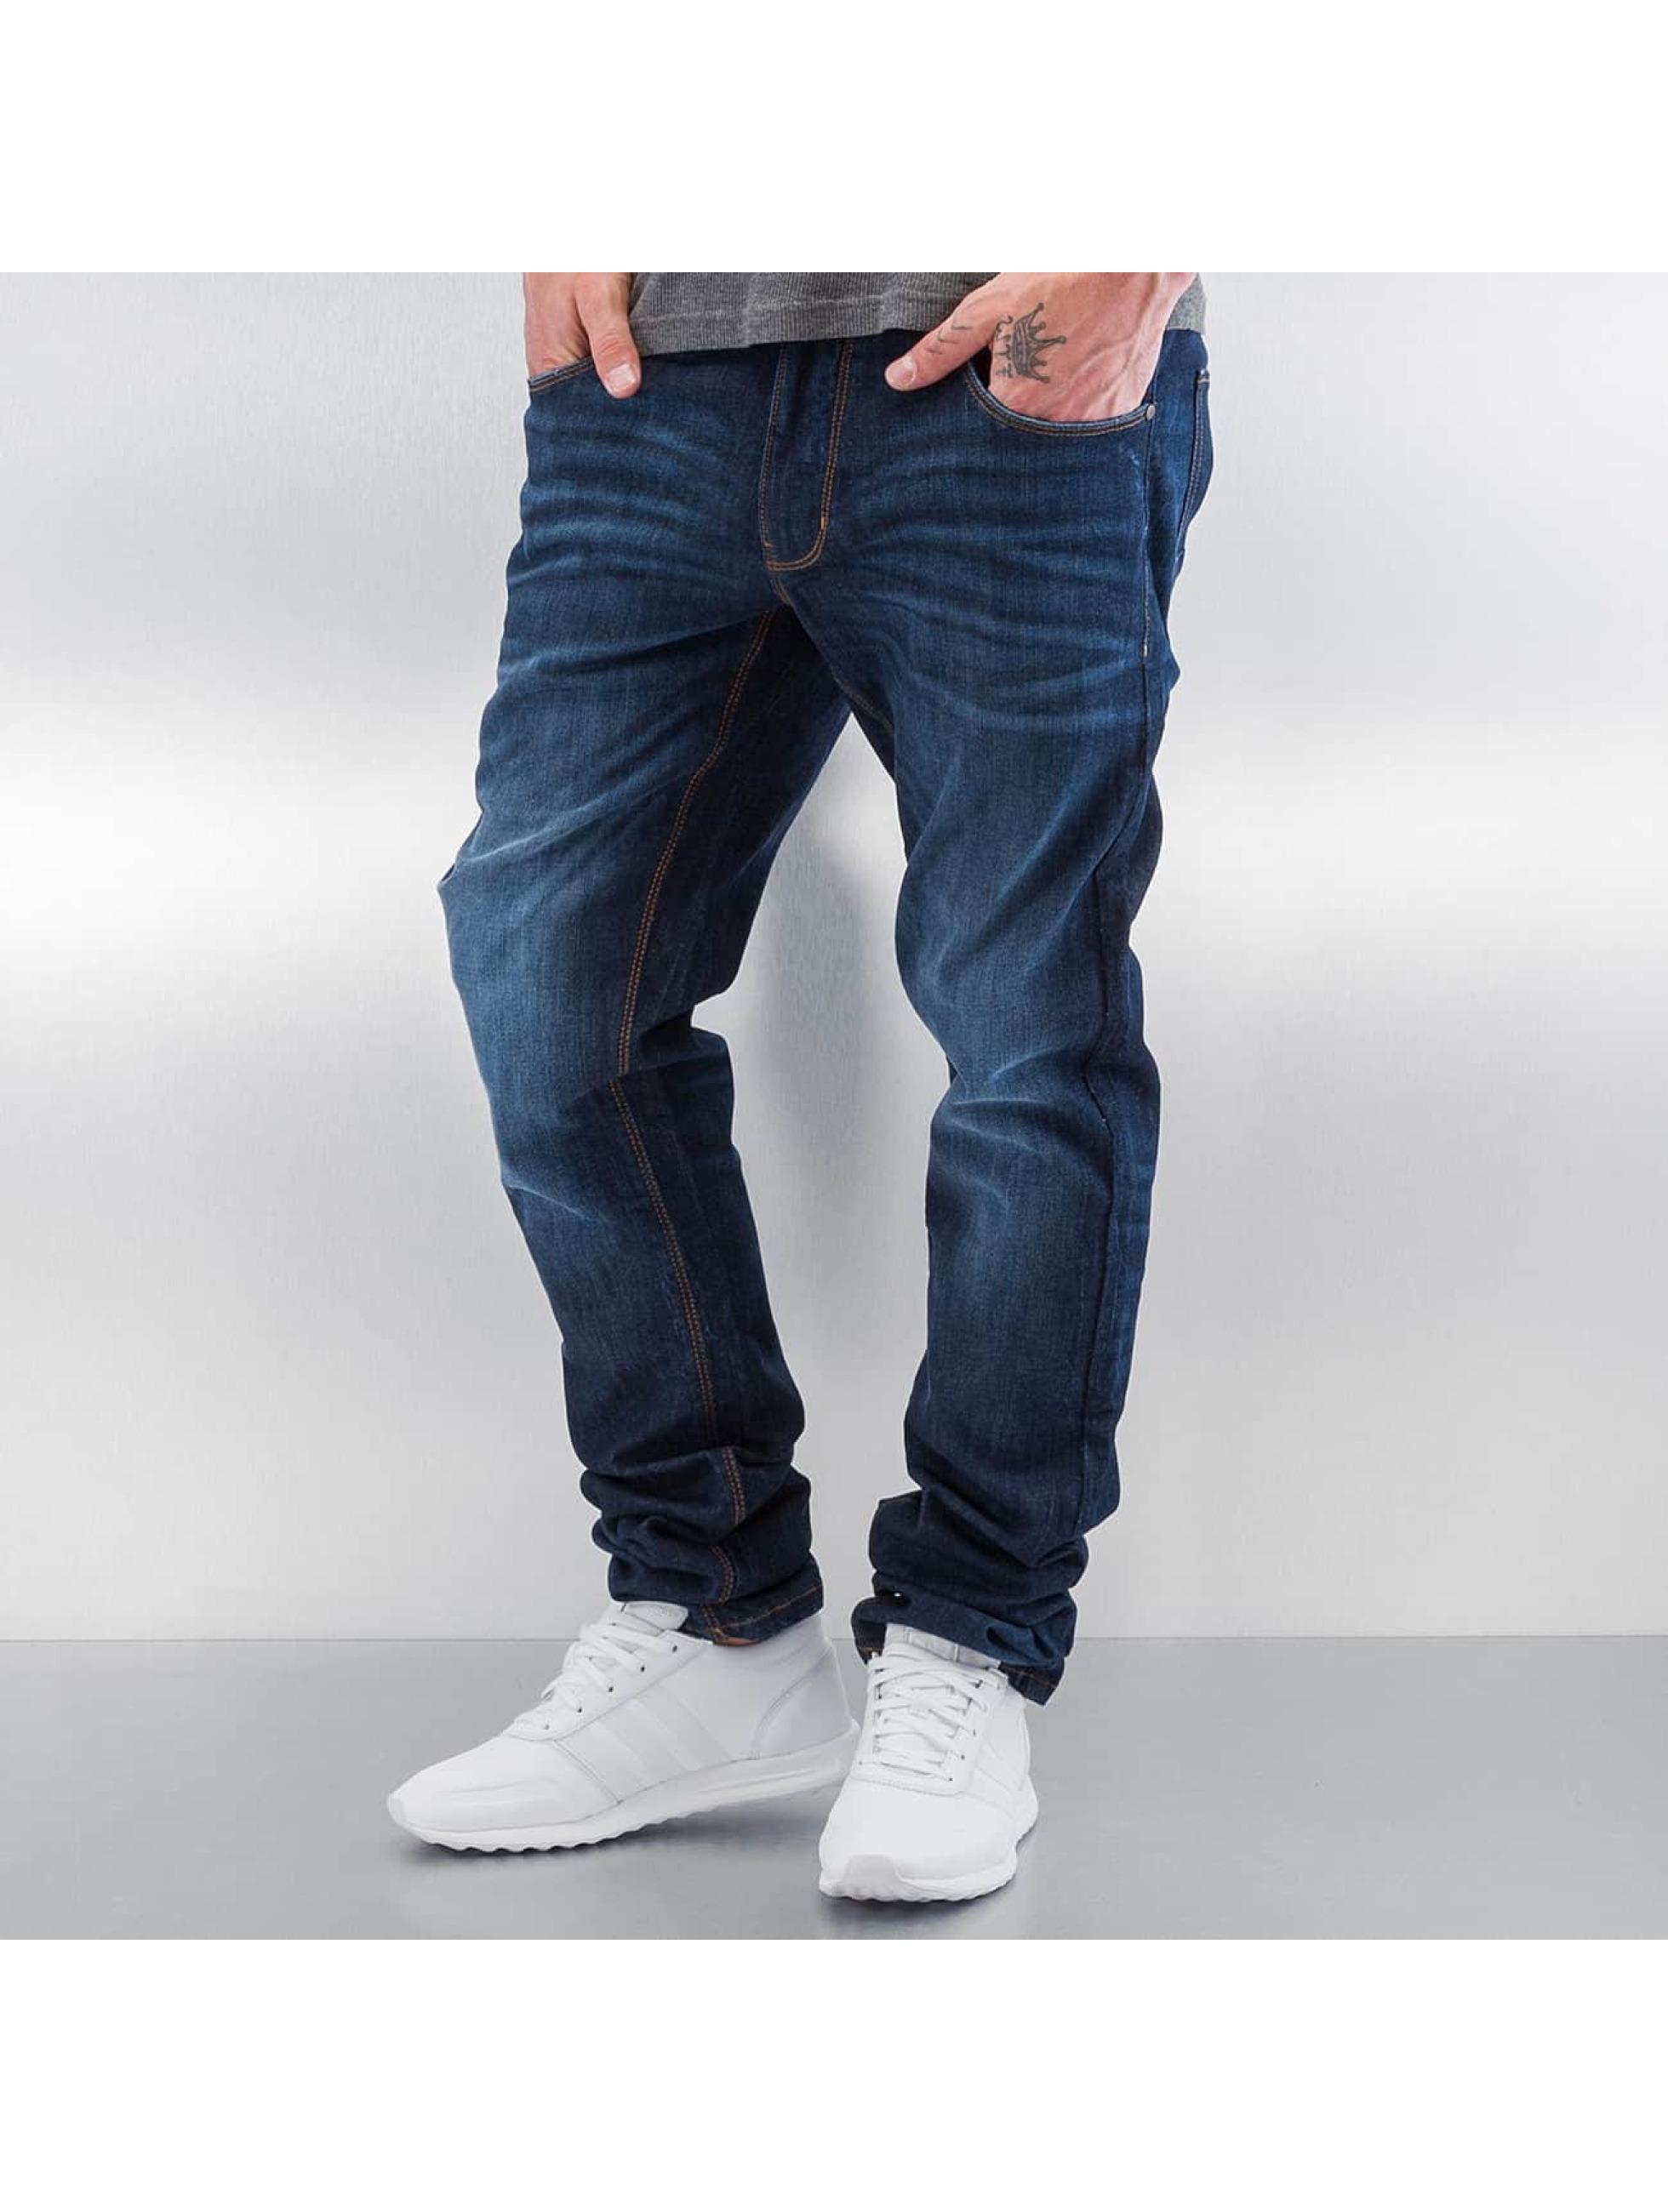 Skinny Jeans Slim in blau